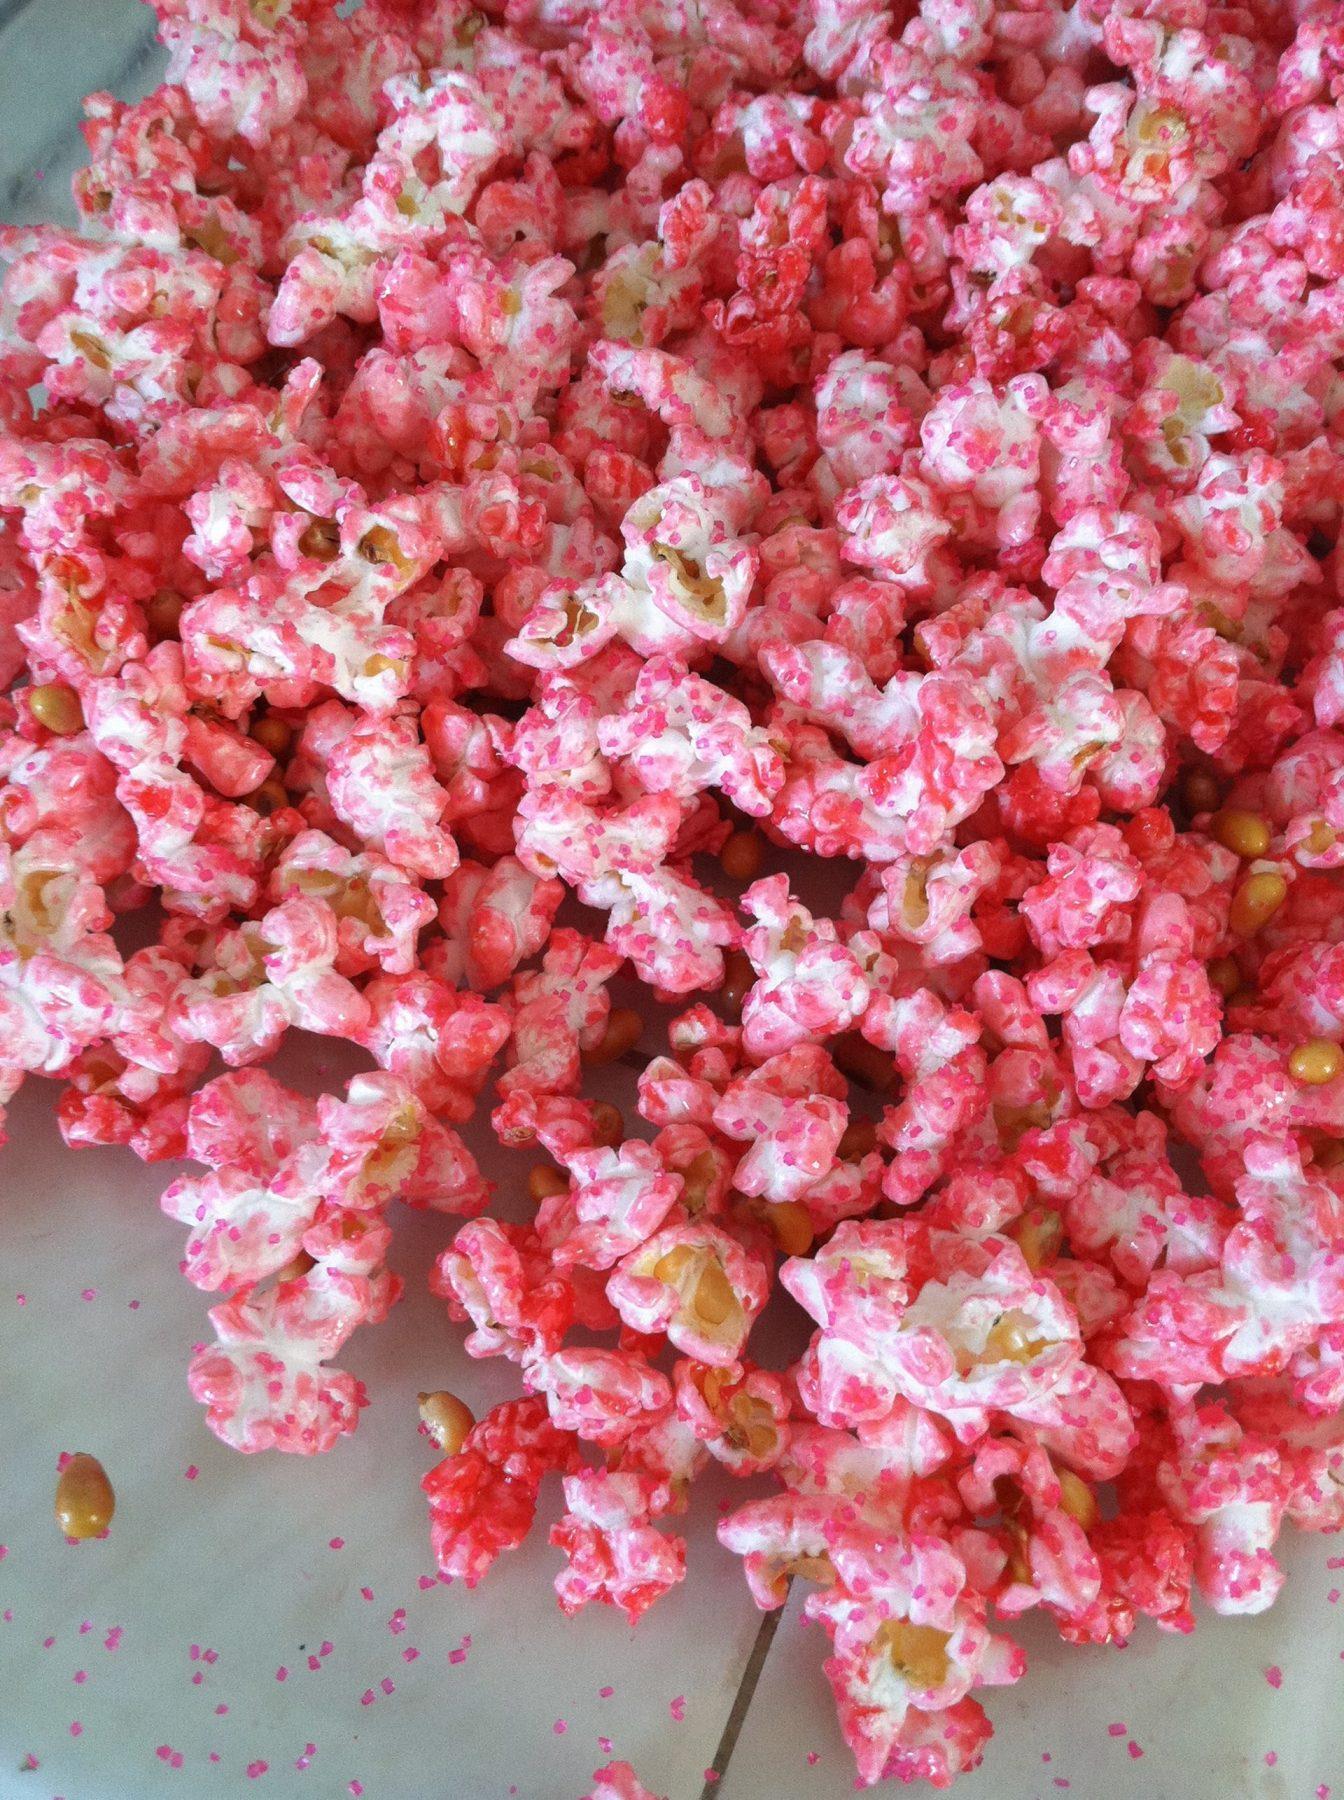 pinkpopcorn